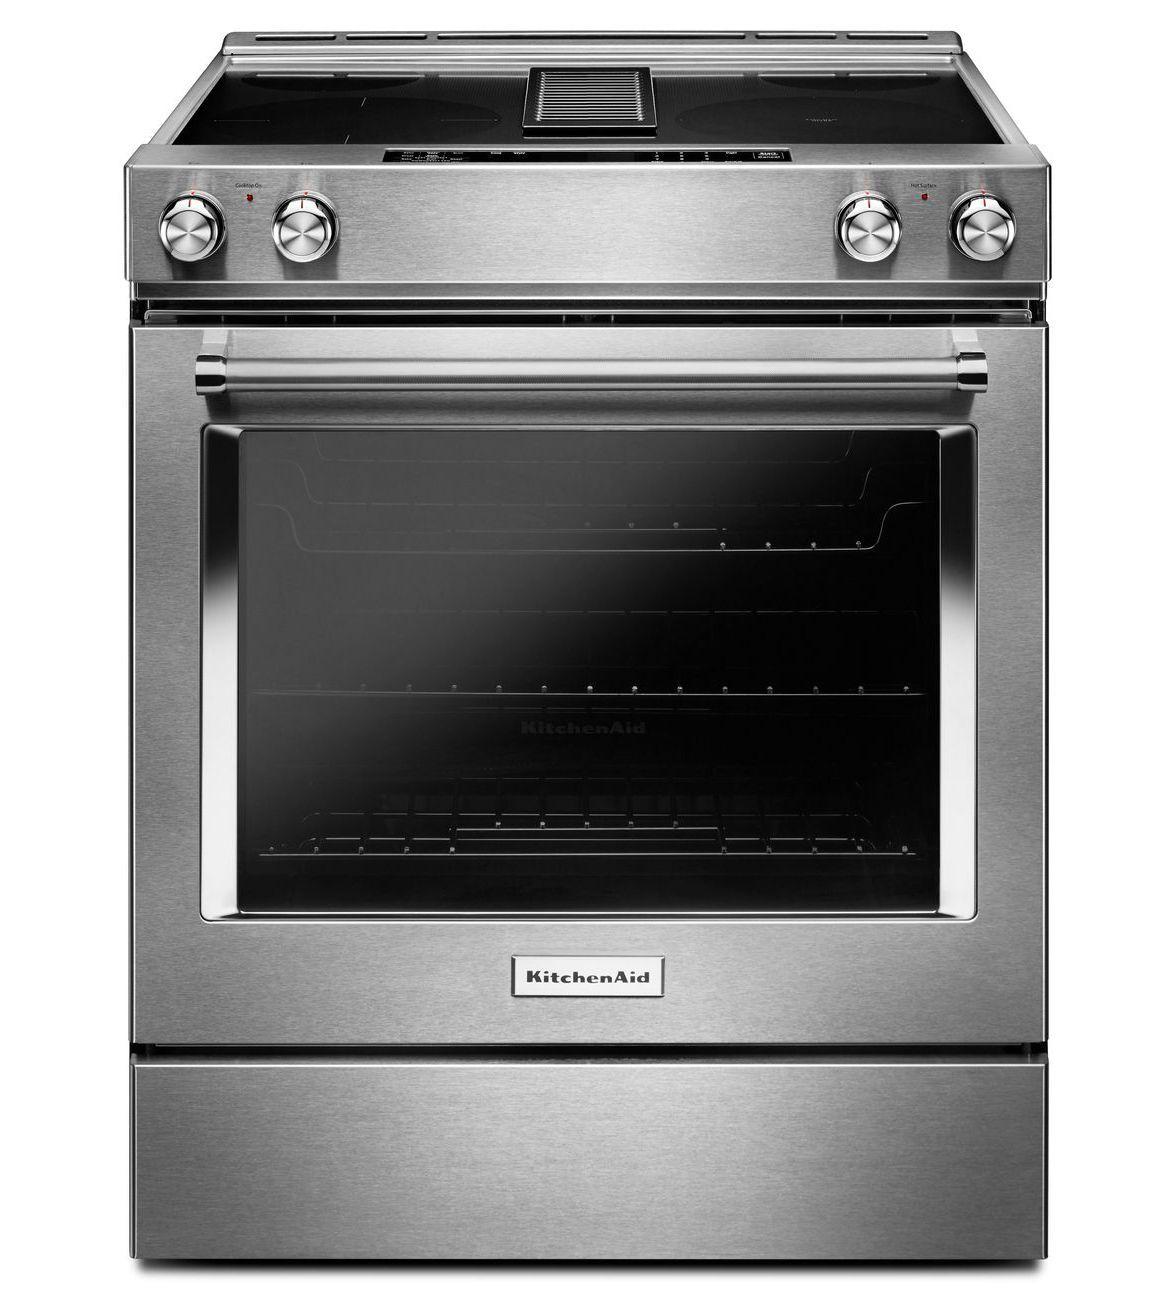 kitchenaid stove top electric